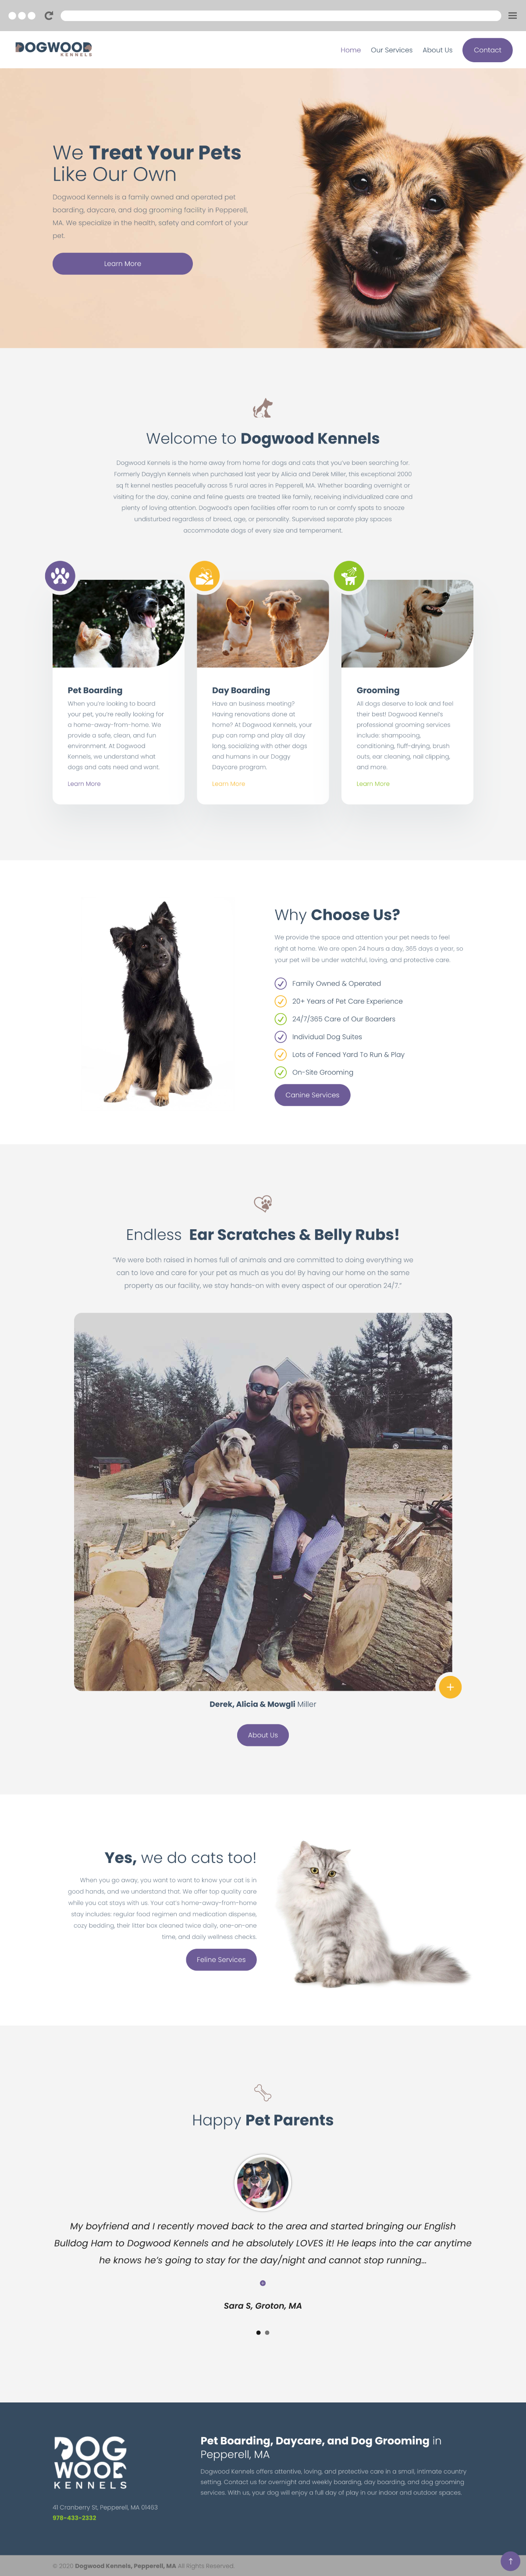 Dogwood Kennels - Pet Boarding & Grooming in Pepperell, MA